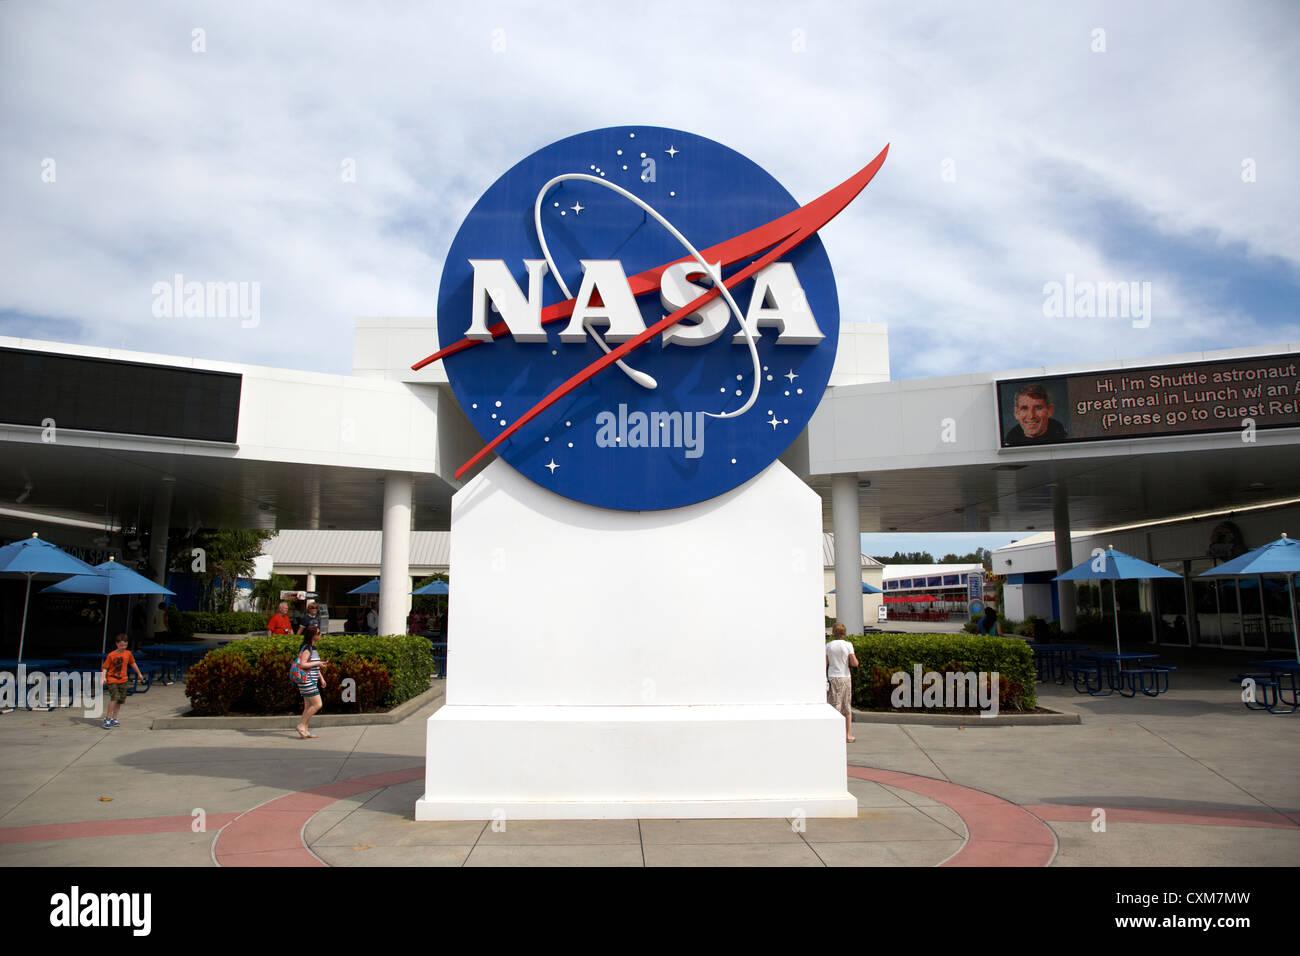 nasa logo emblem insignia at the Kennedy Space Center Florida USA - Stock Image